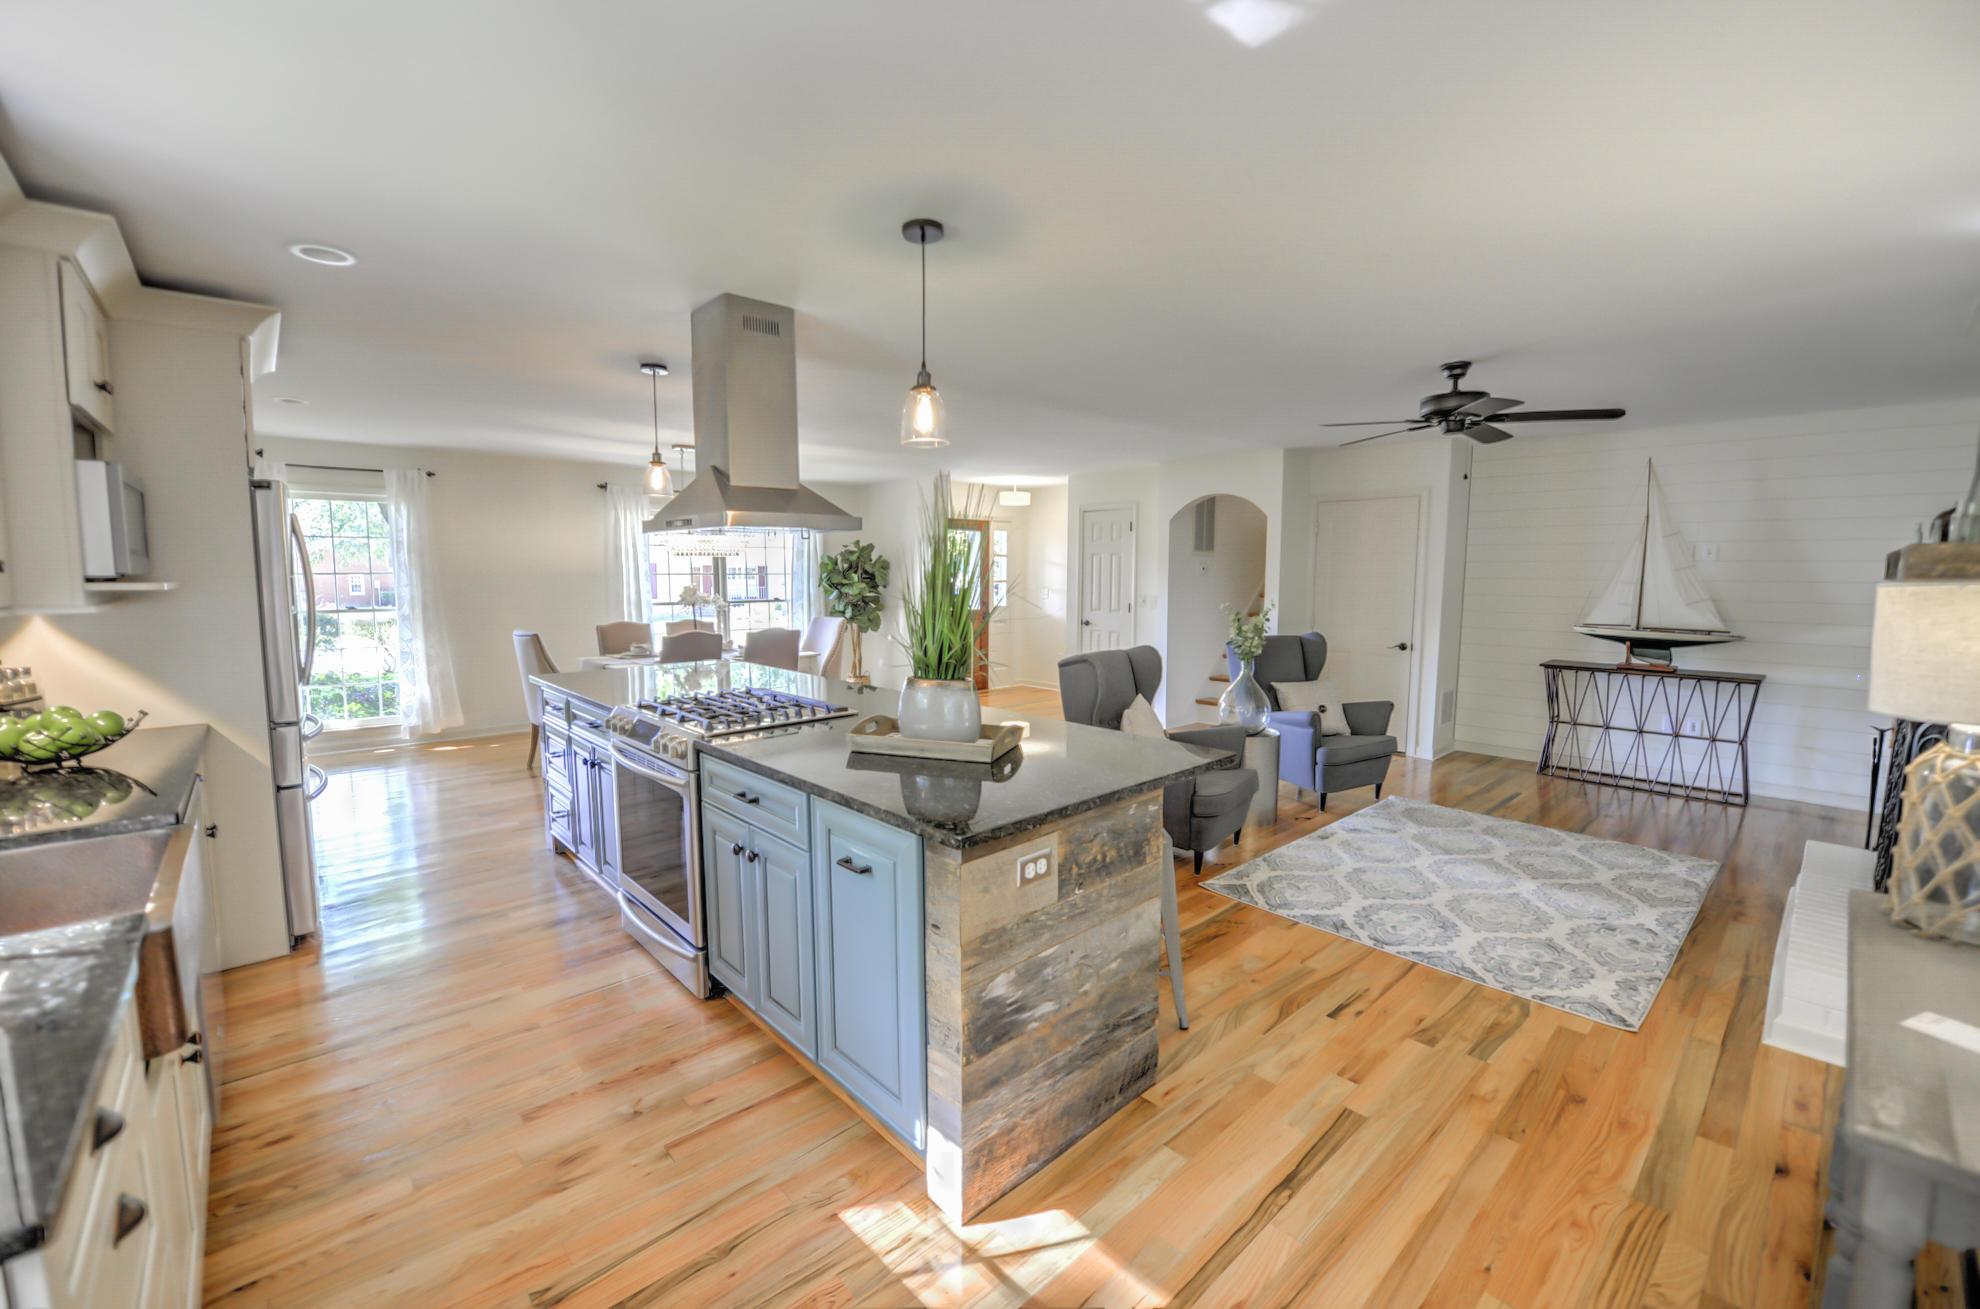 Shemwood II Homes For Sale - 1017 Jack Snipe, Mount Pleasant, SC - 0